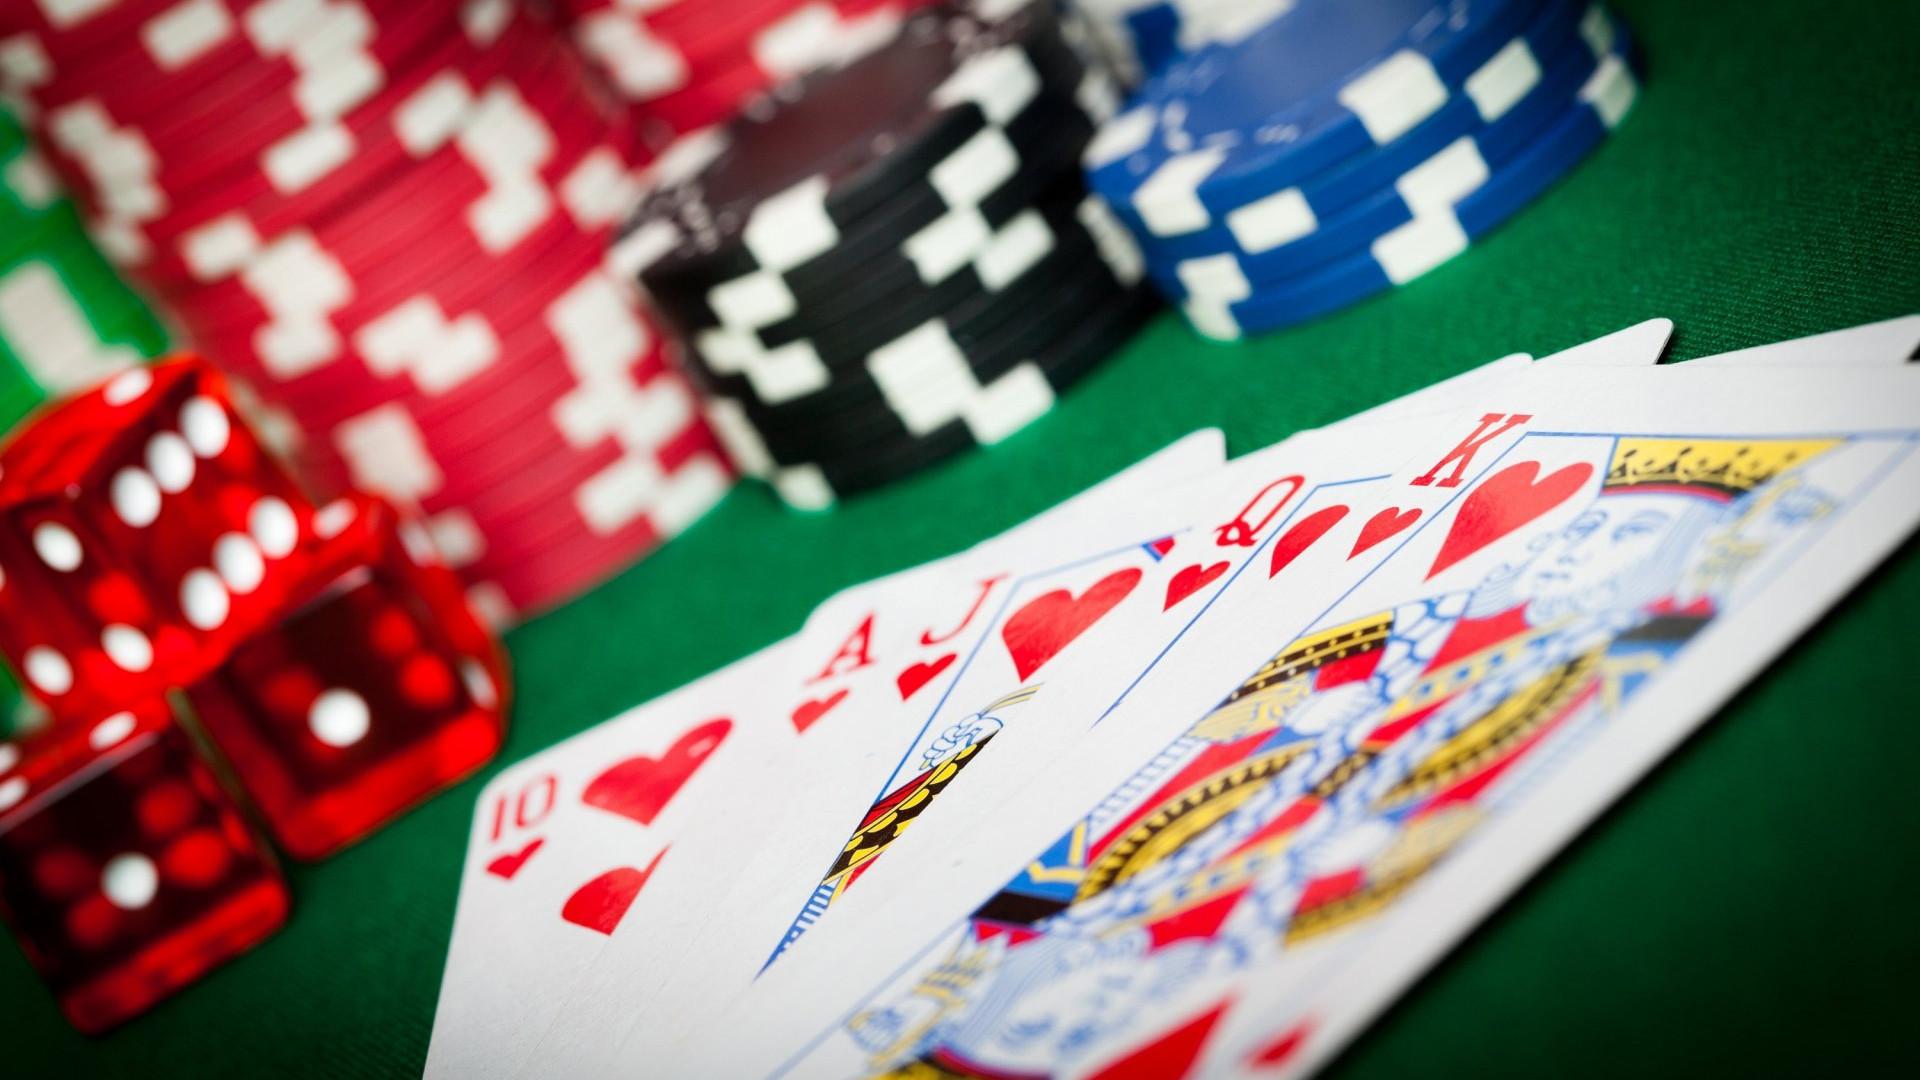 Online Casino Regulierung Im Juni 2021?